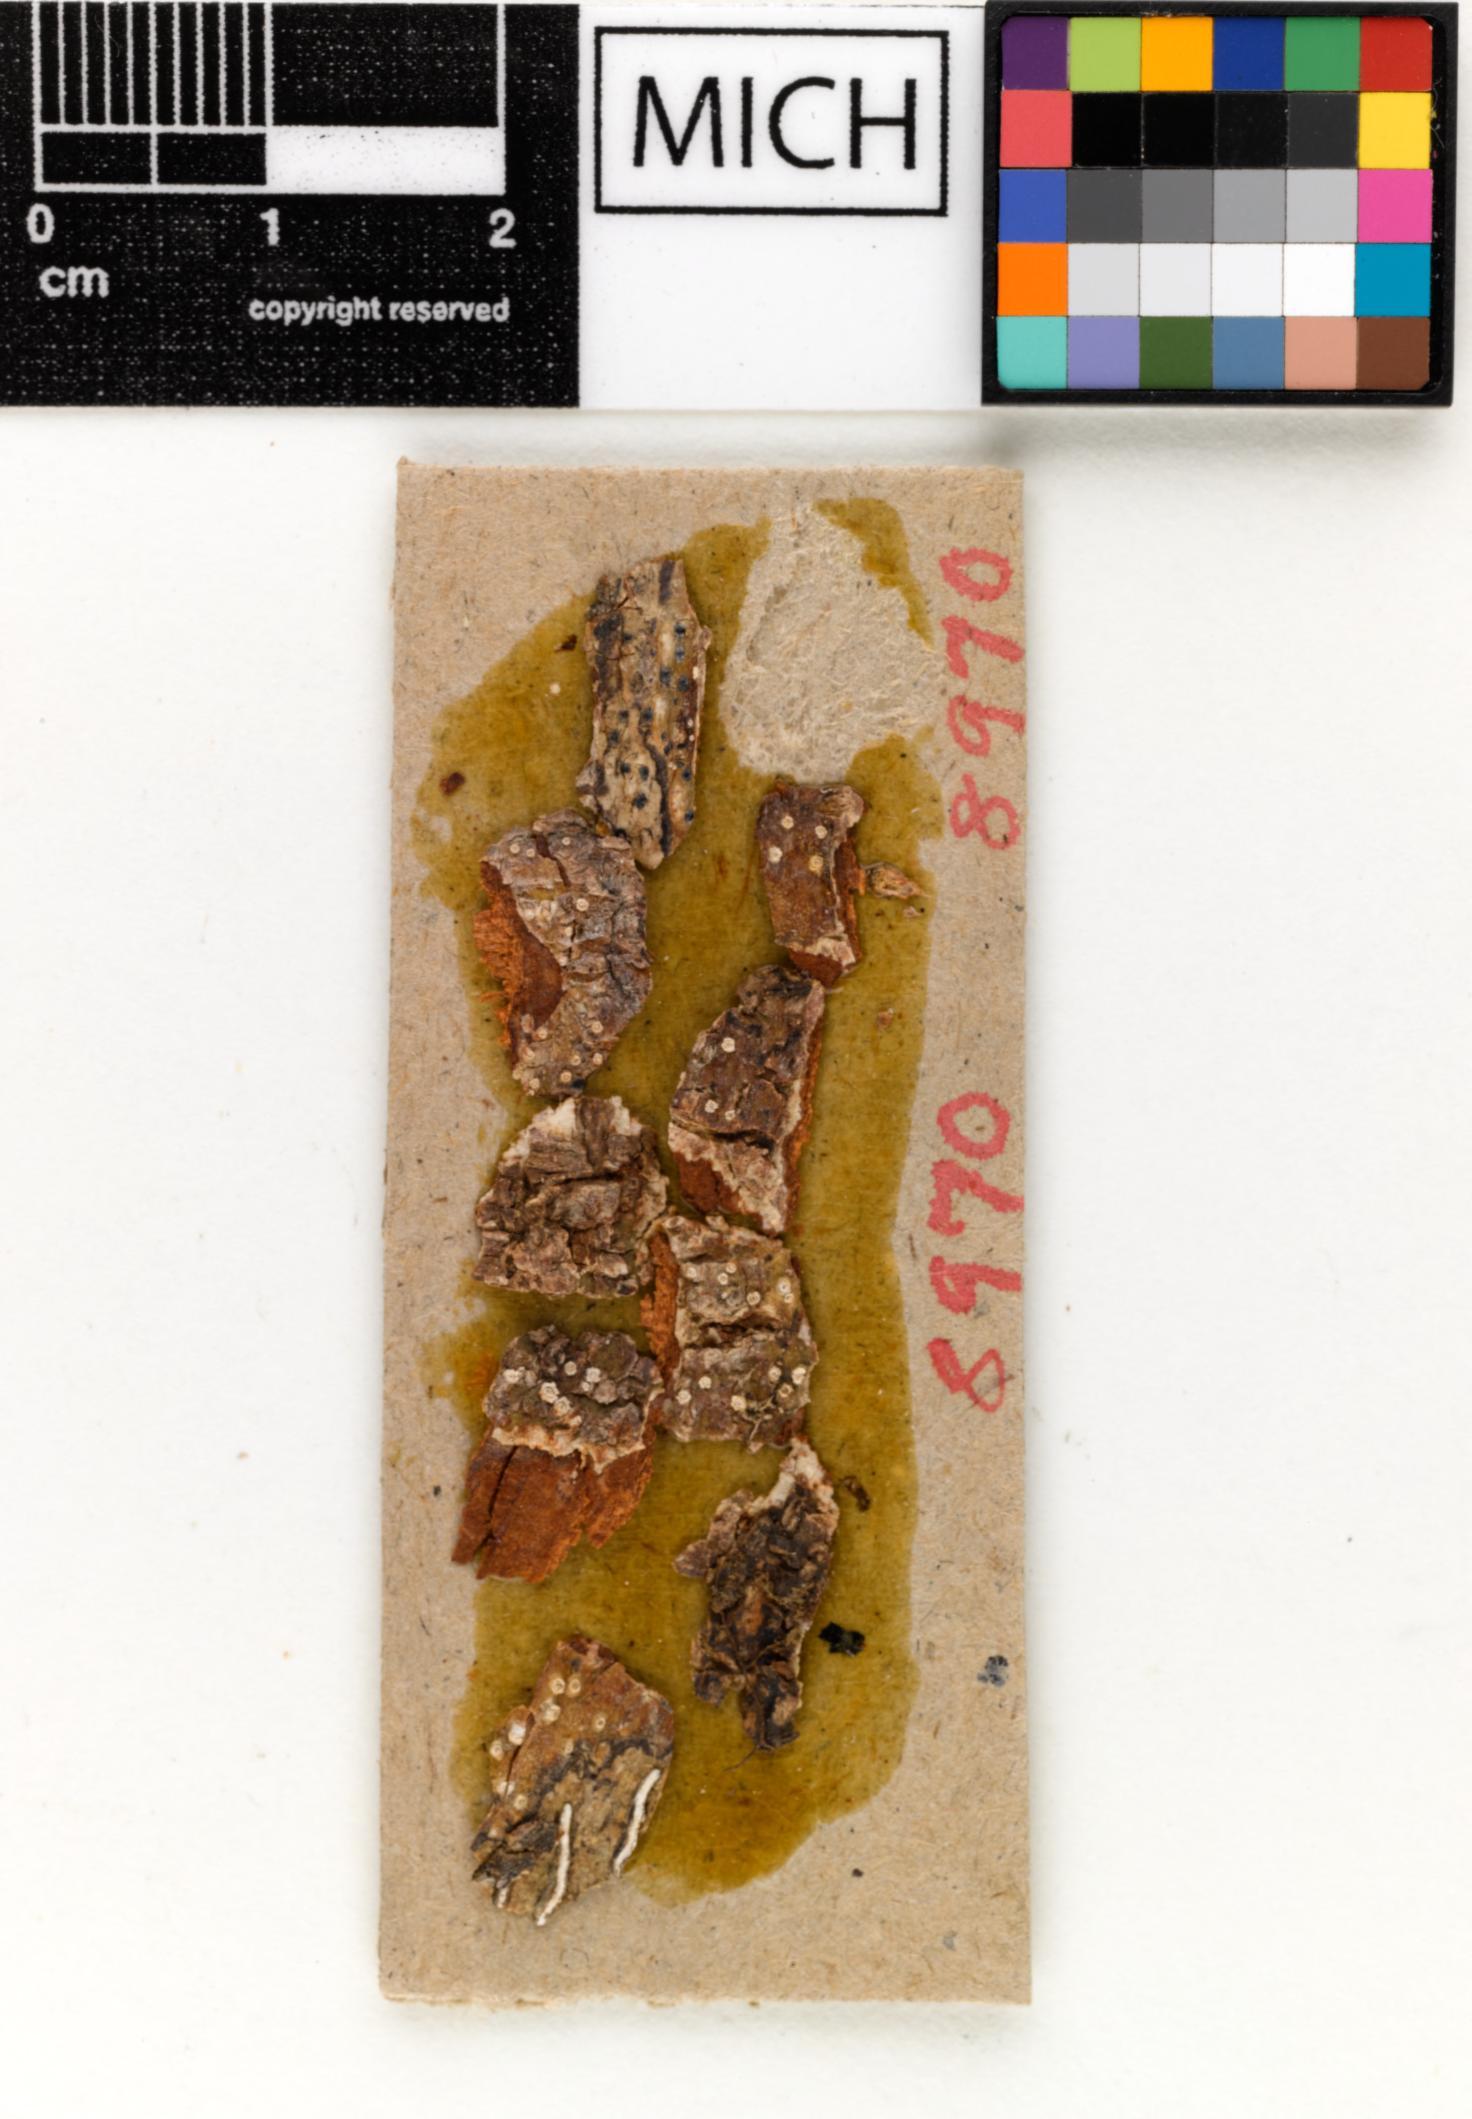 Thelotrema albo-olivaceum image